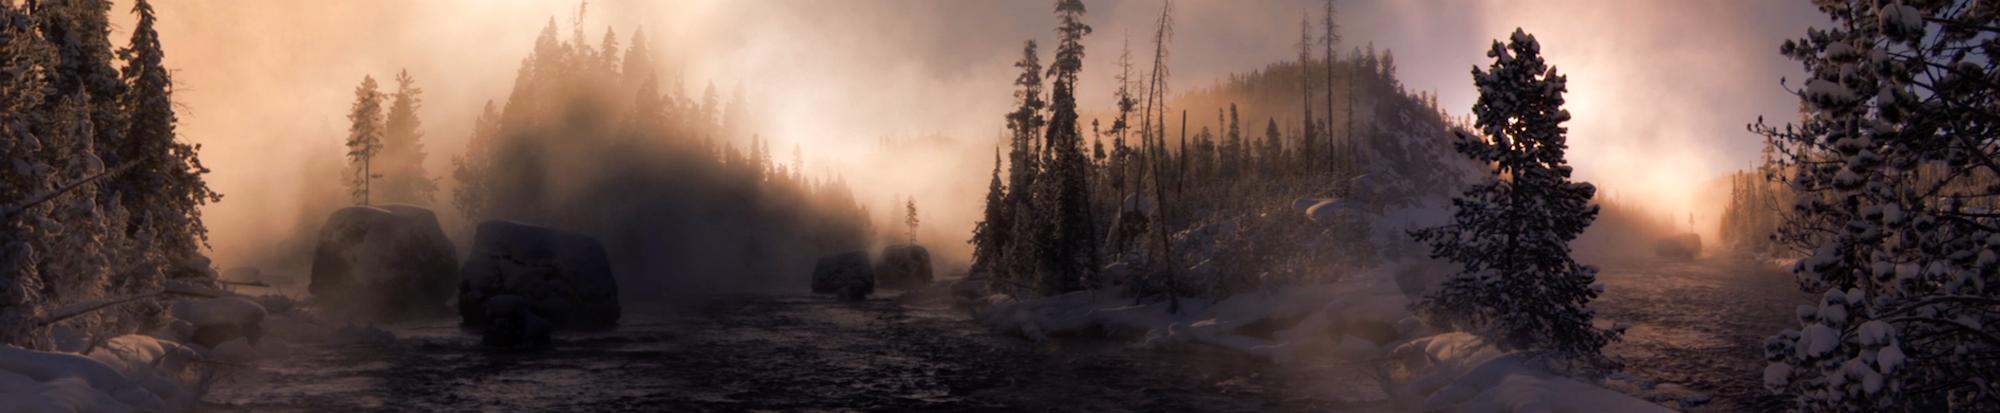 Yellowstone03.png